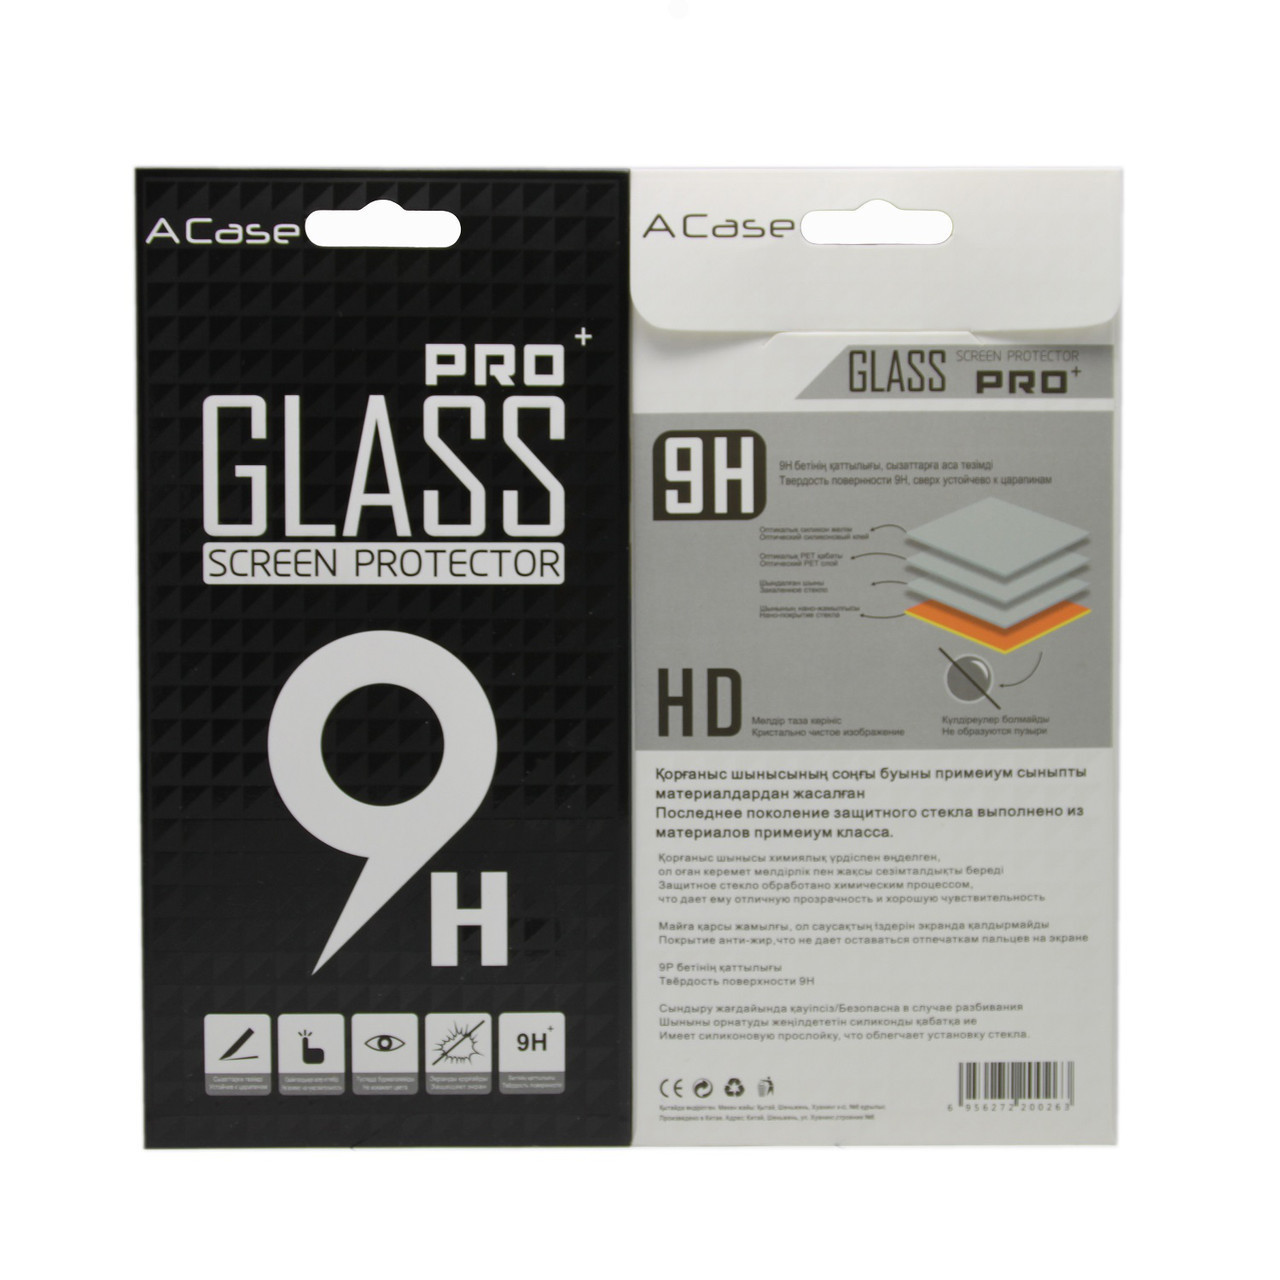 Защитное стекло Samsung S8 Plus 2017, G955 2017 A-Case - фото 2